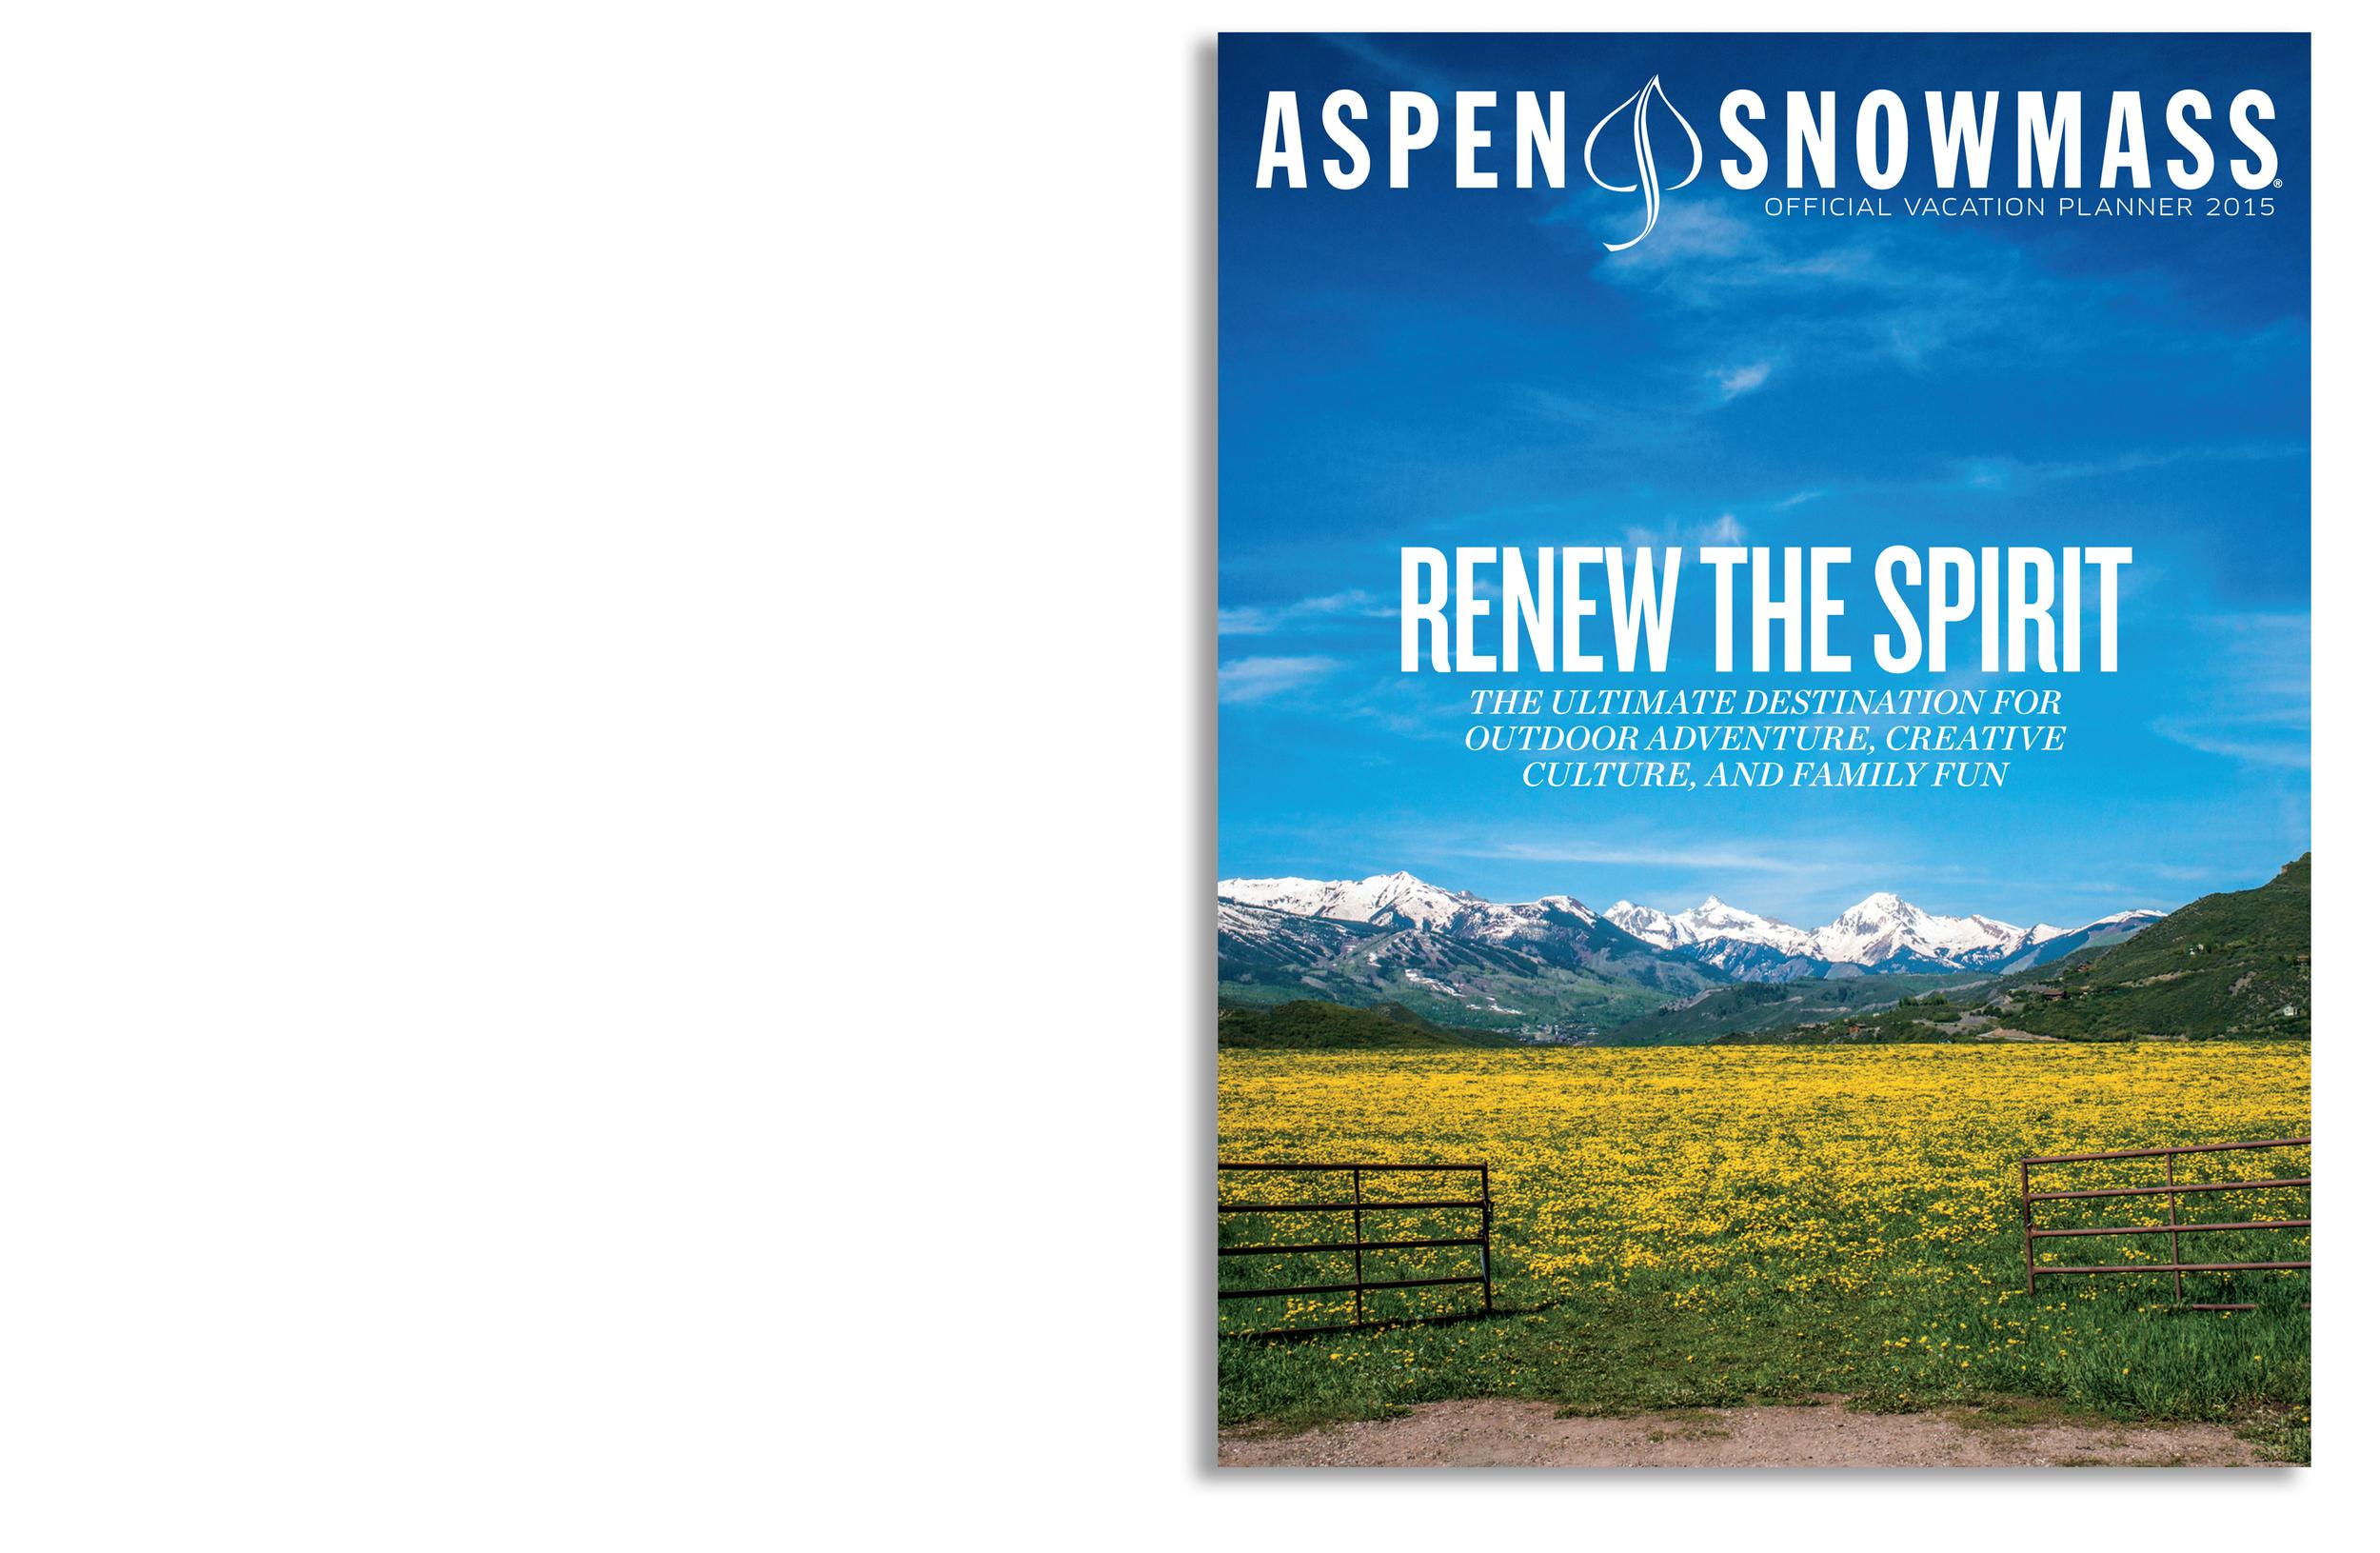 aspensnow-cover.jpg